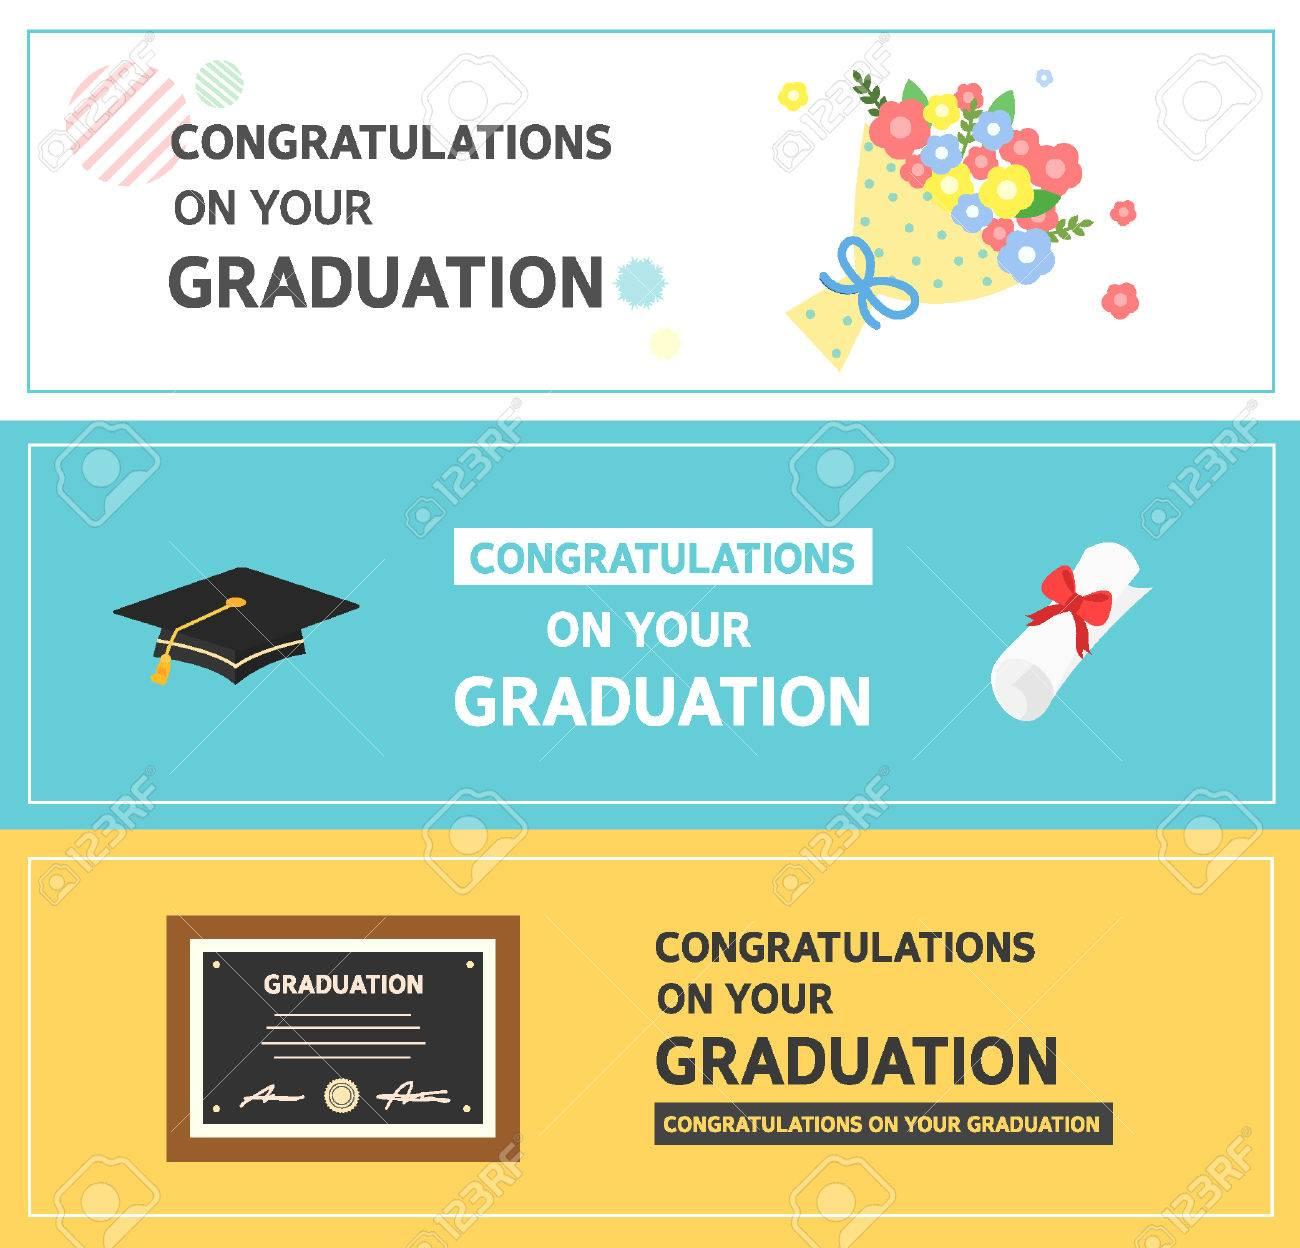 graduation congratulations event banner - 40433338